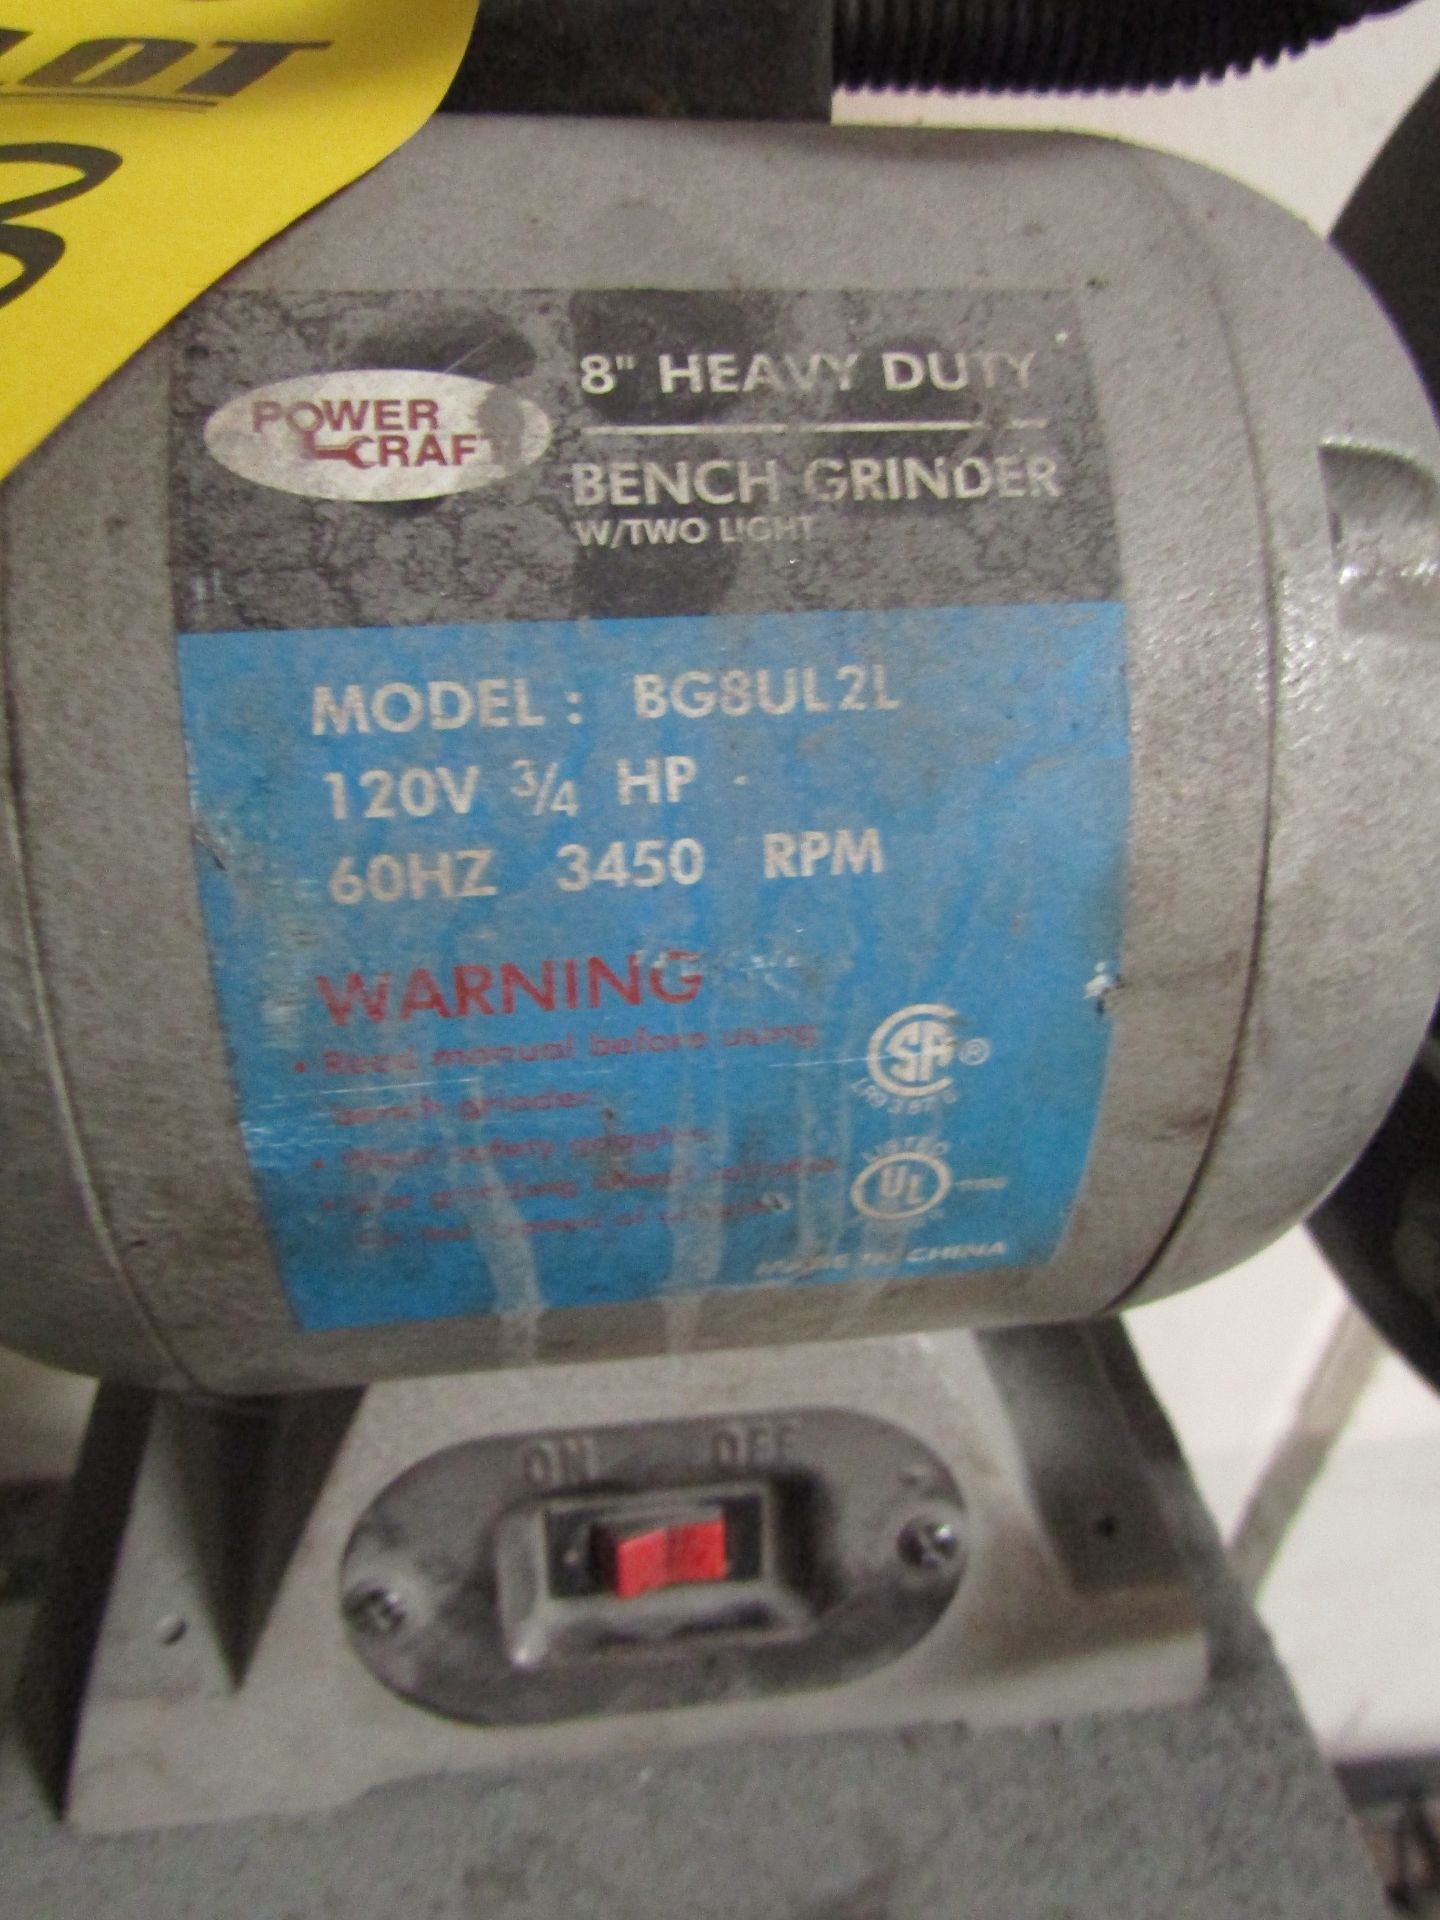 "Lot 33 - POWERCRAFT 8"" Heavy Duty Pedestal Grinder, Model BG8UL2L, 120 V, 3/4 HP, 60 HZ, 3450 RPM"